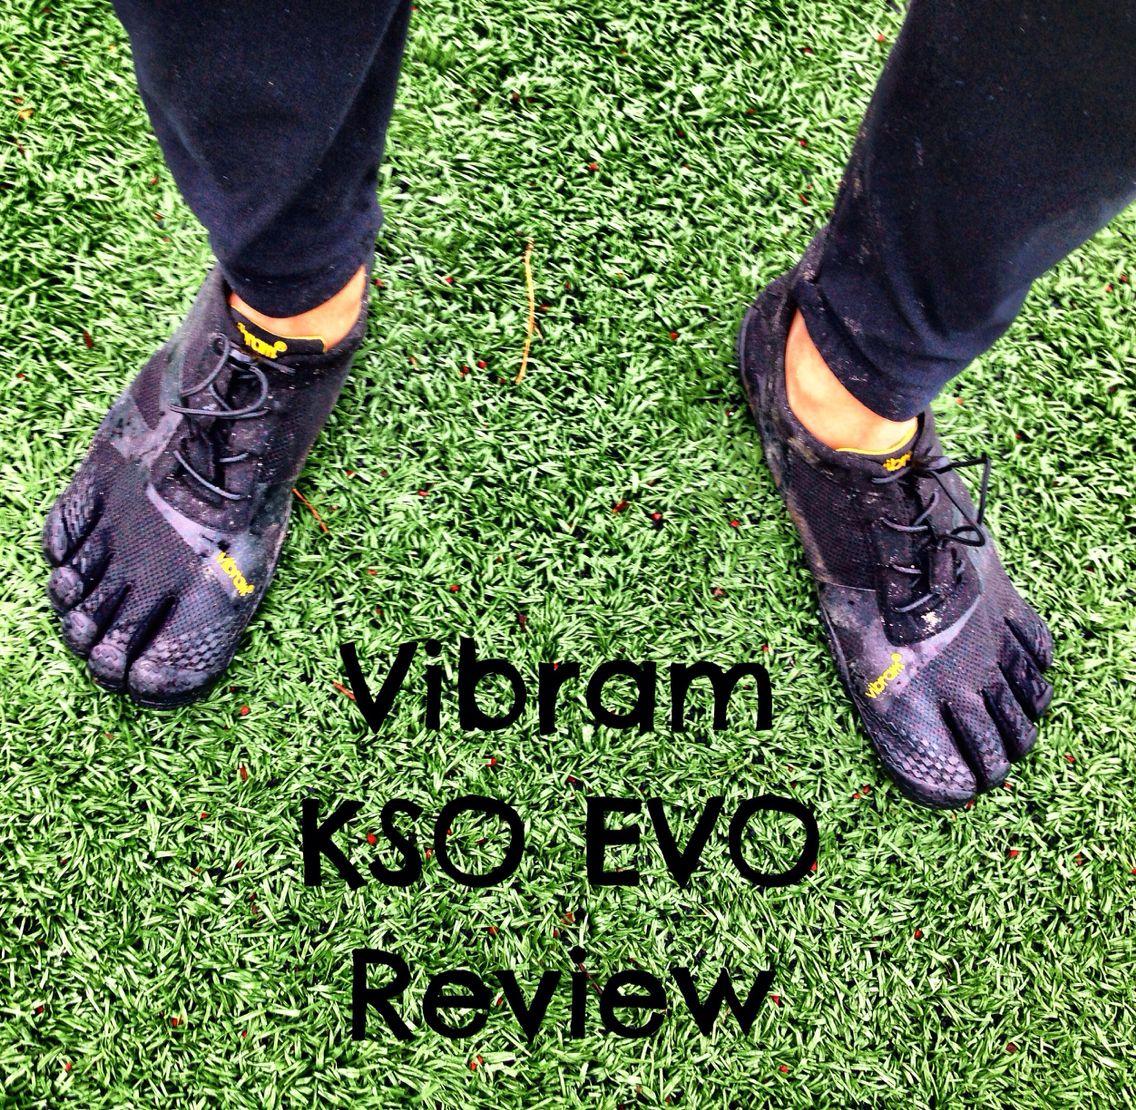 sale retailer 53257 2e4ad Review of the Vibram FiveFingers KSO EVO for Running